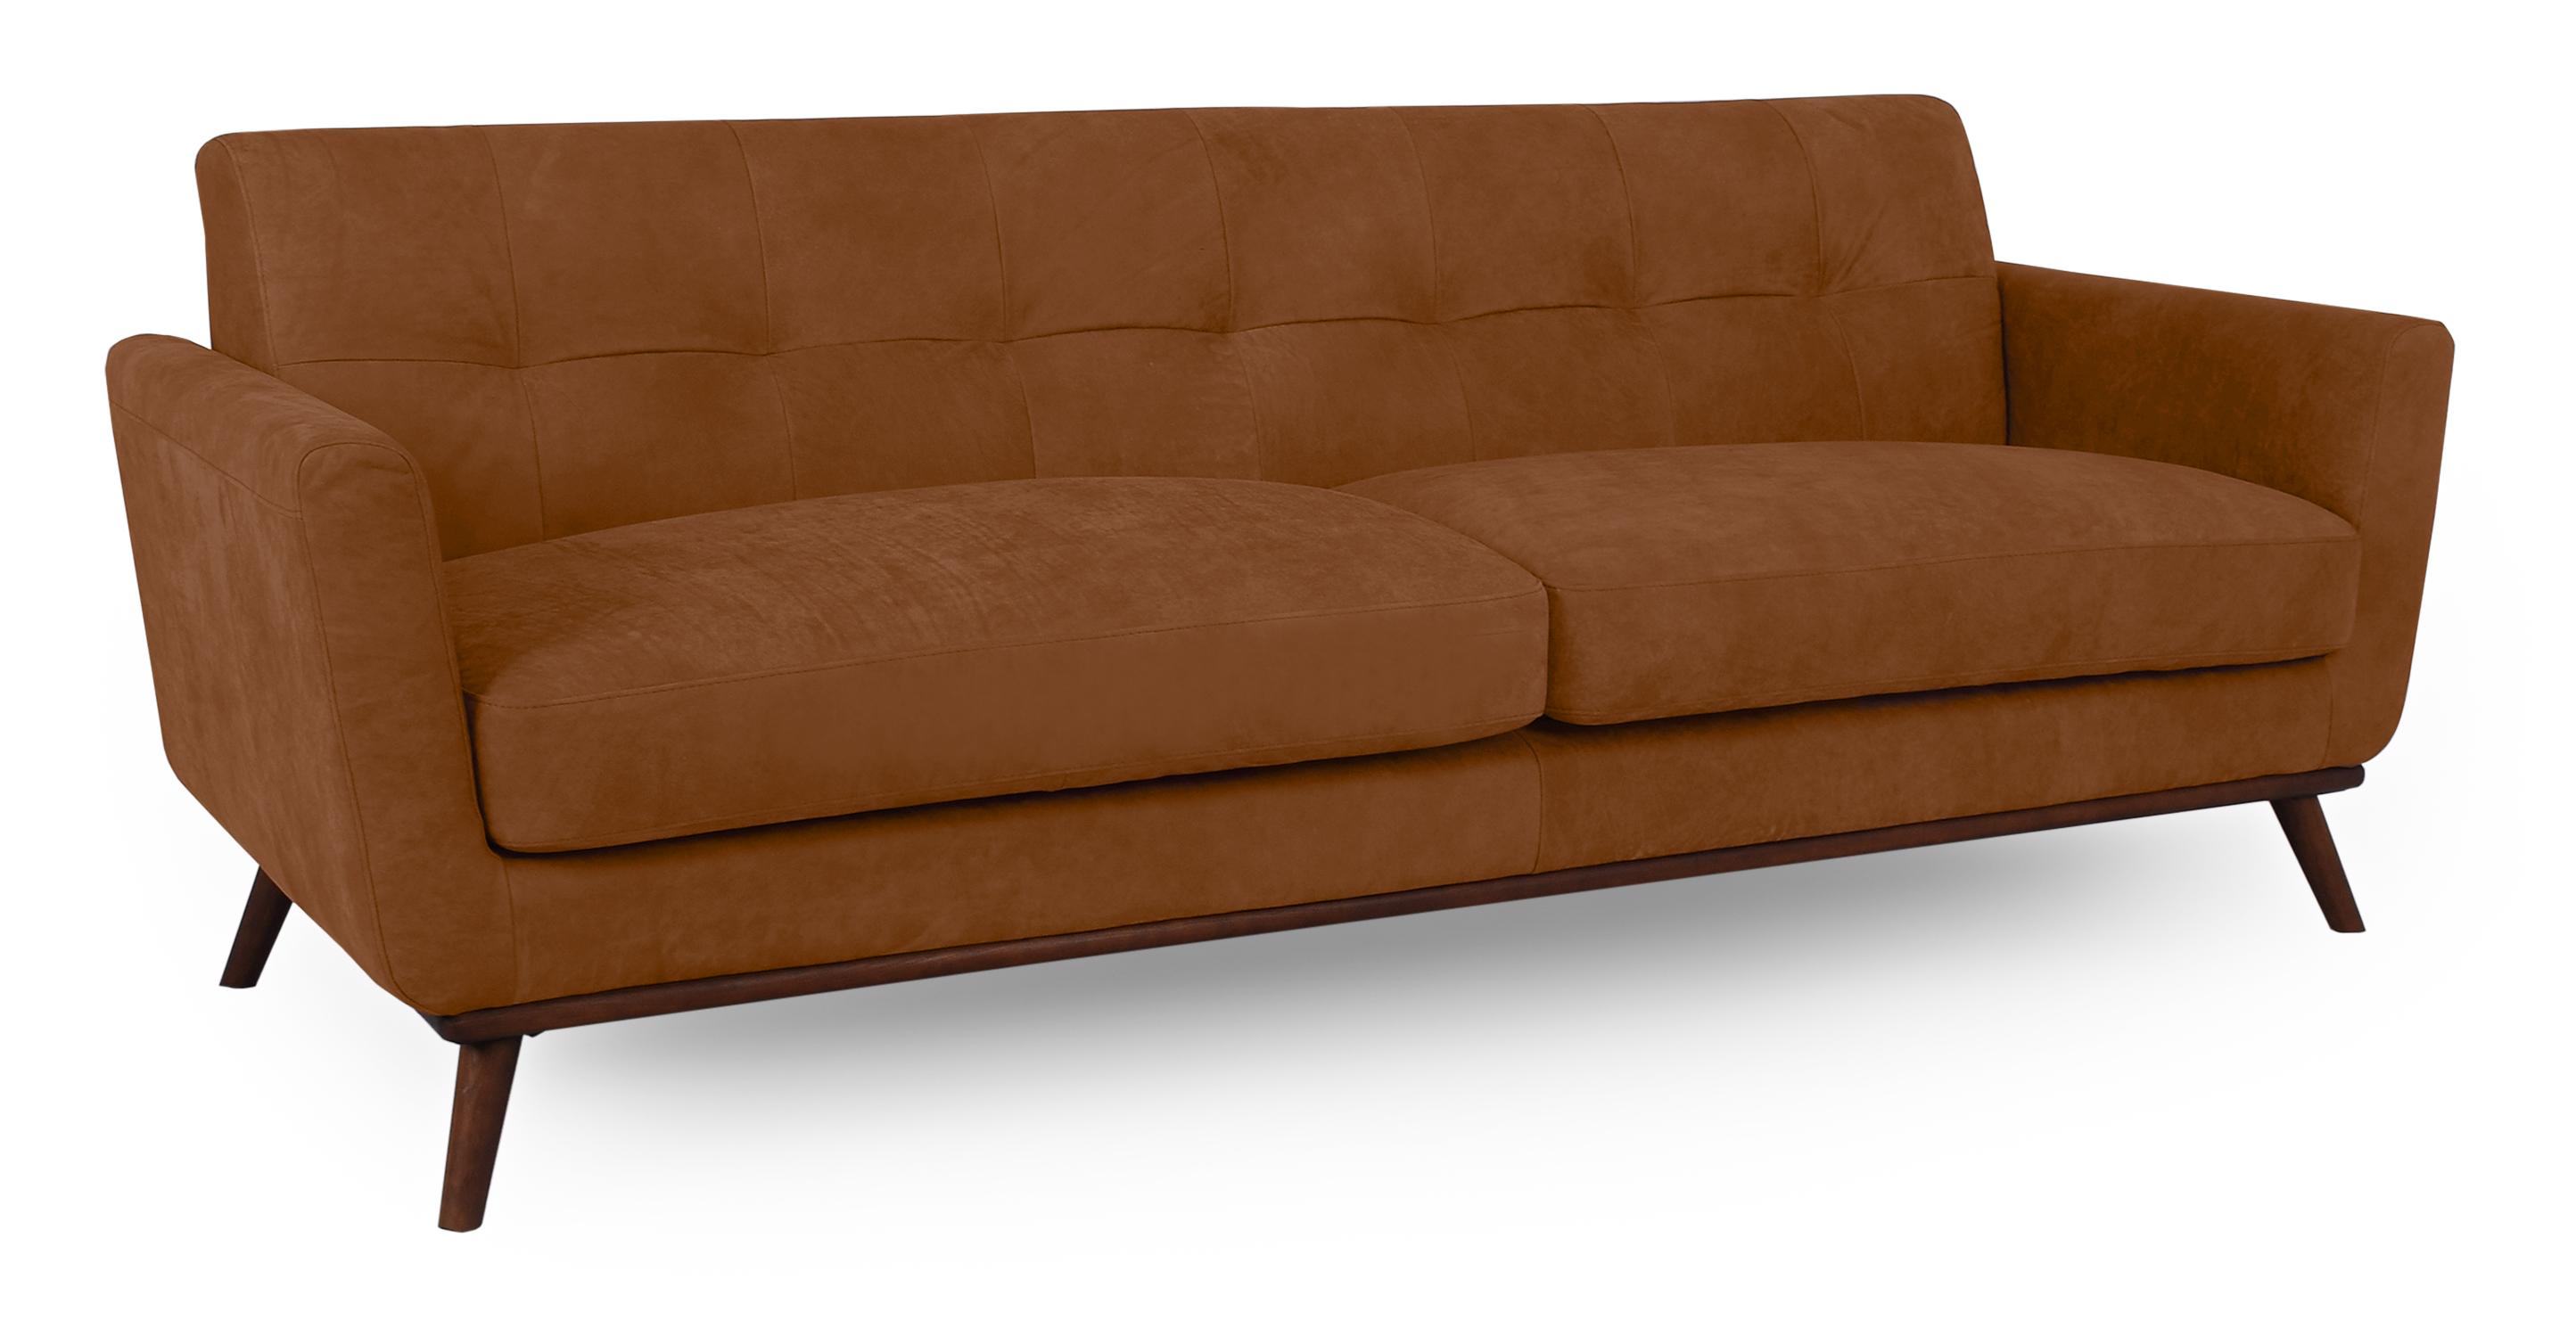 "Jackie 88"" Leather Sofa, Pecan"